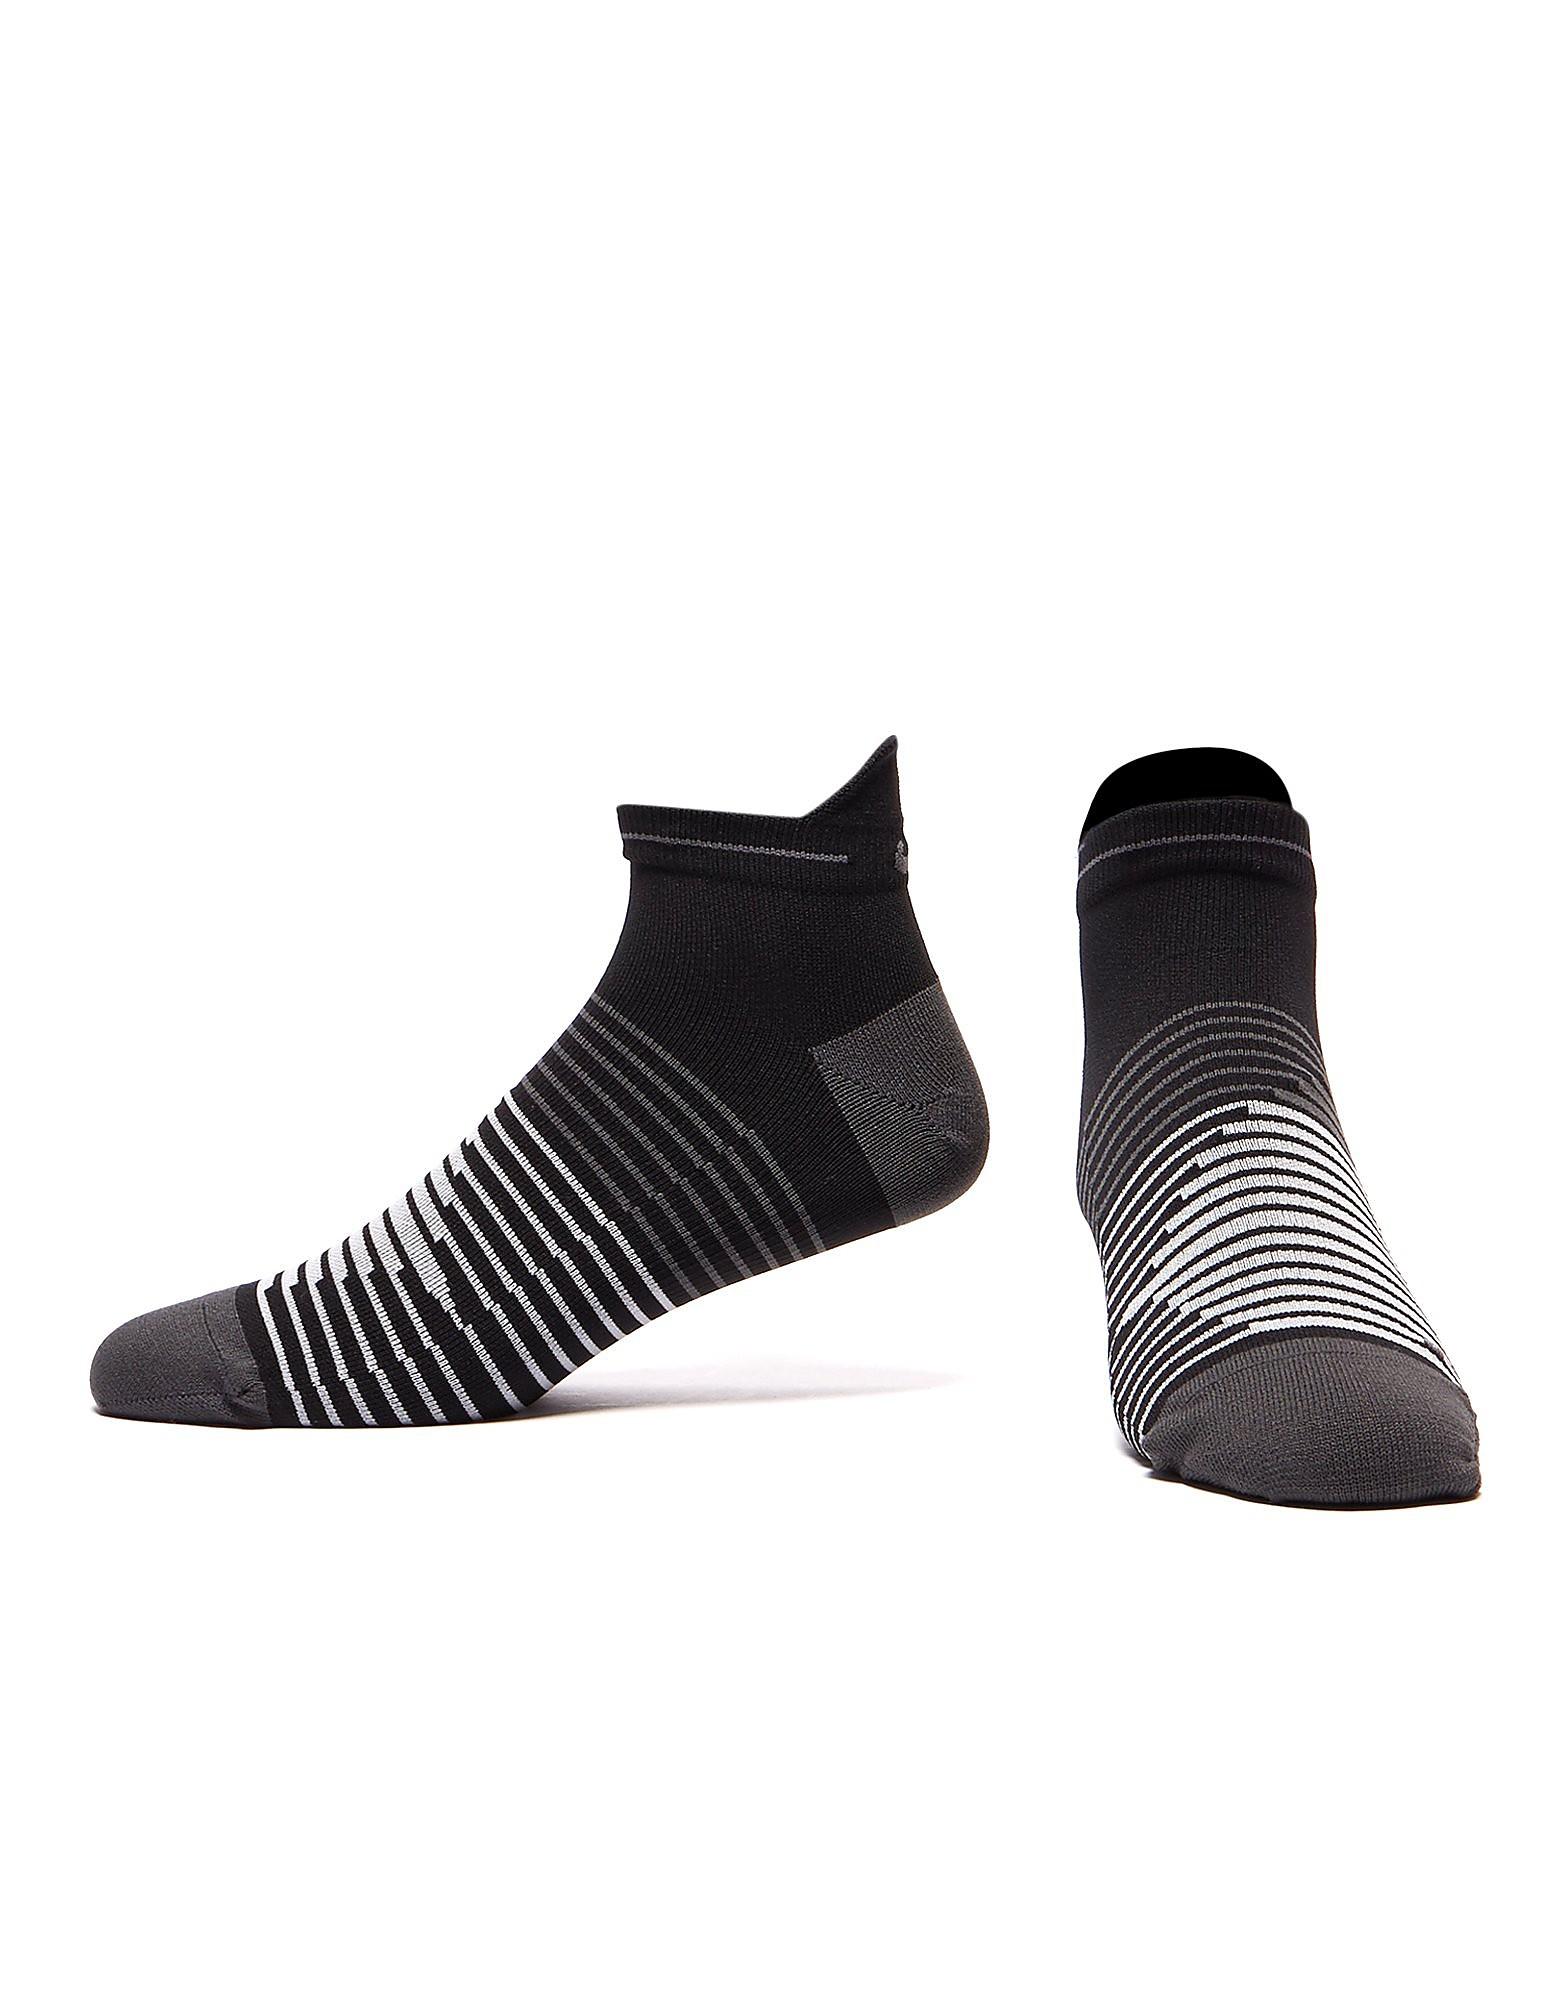 Nike Run Performance Lightweight Socks